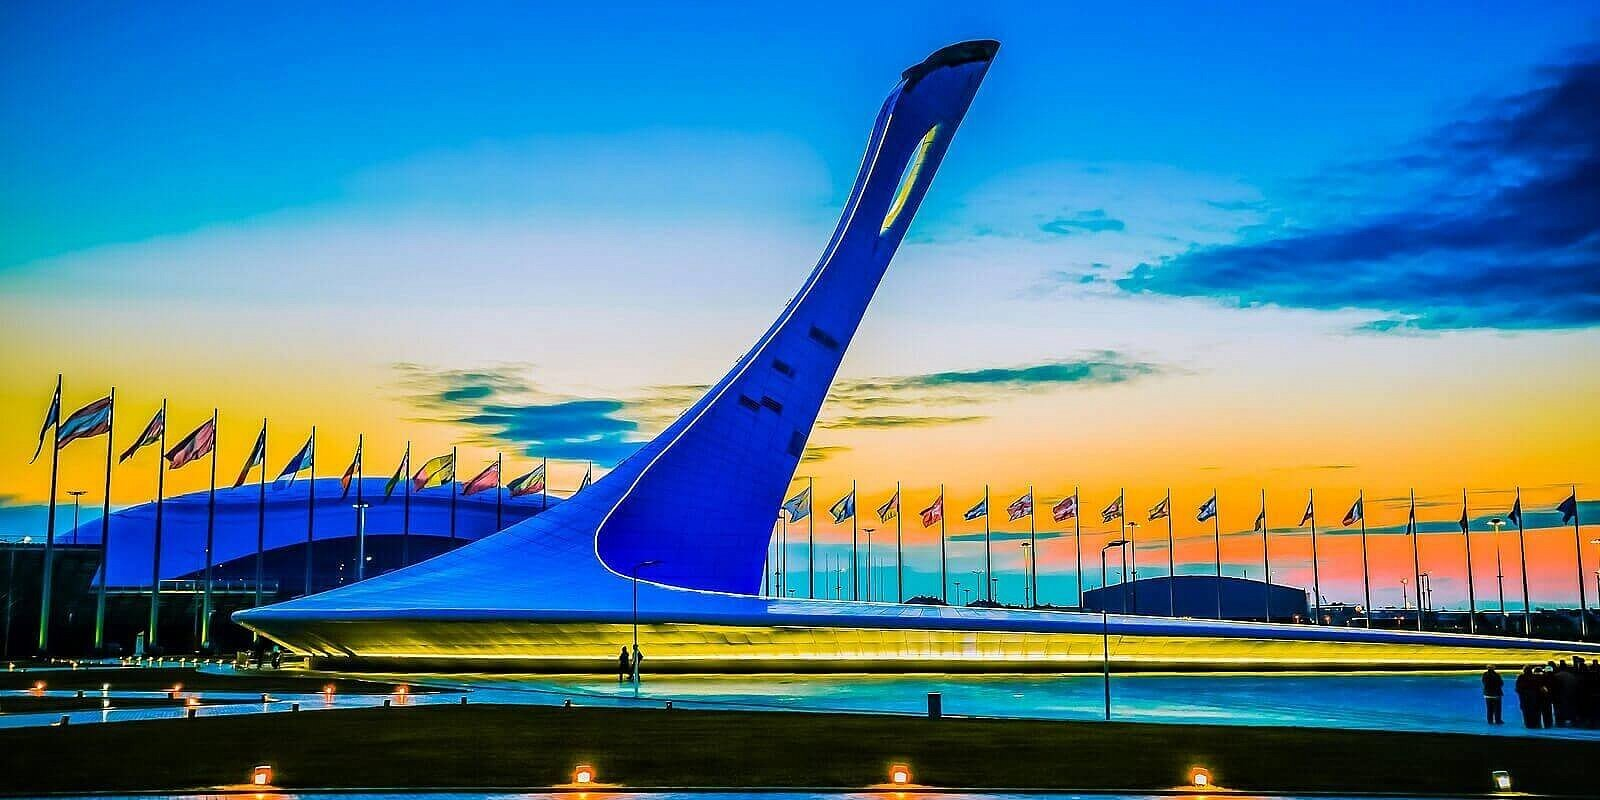 экскурсии по олимпийскому парку на Электрокарах #11